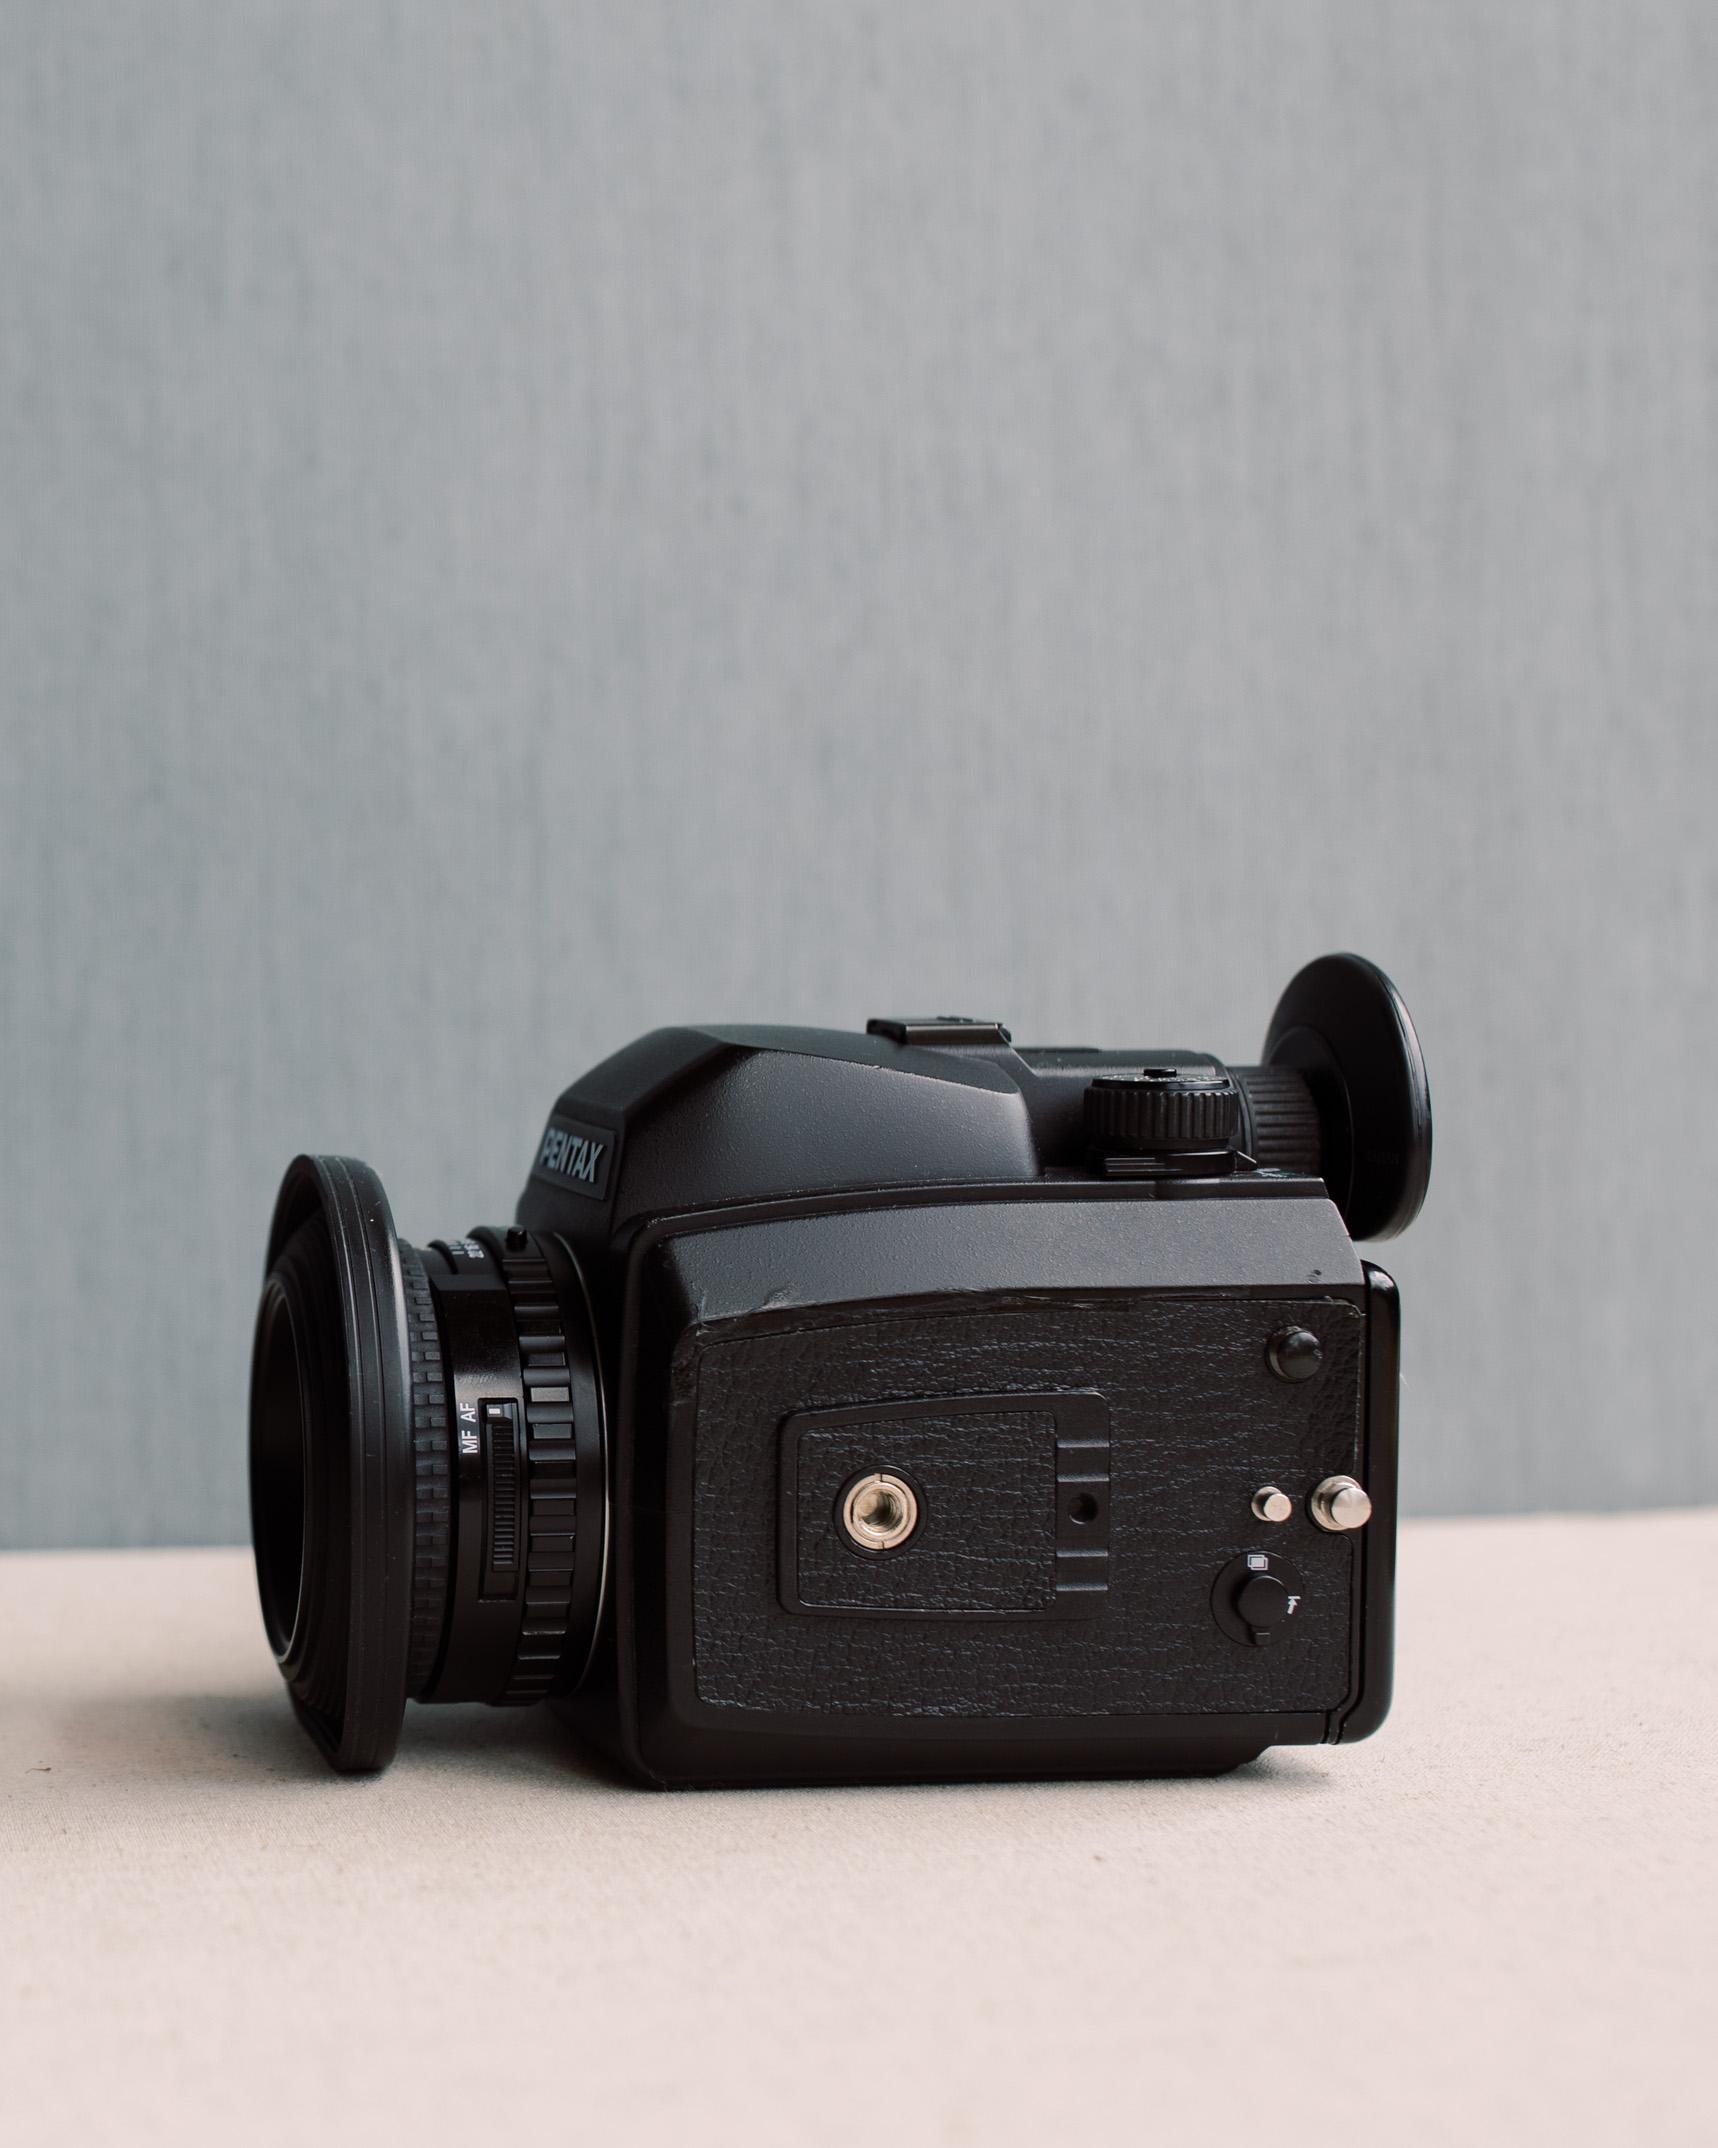 Pentax 645 review image-1.jpg